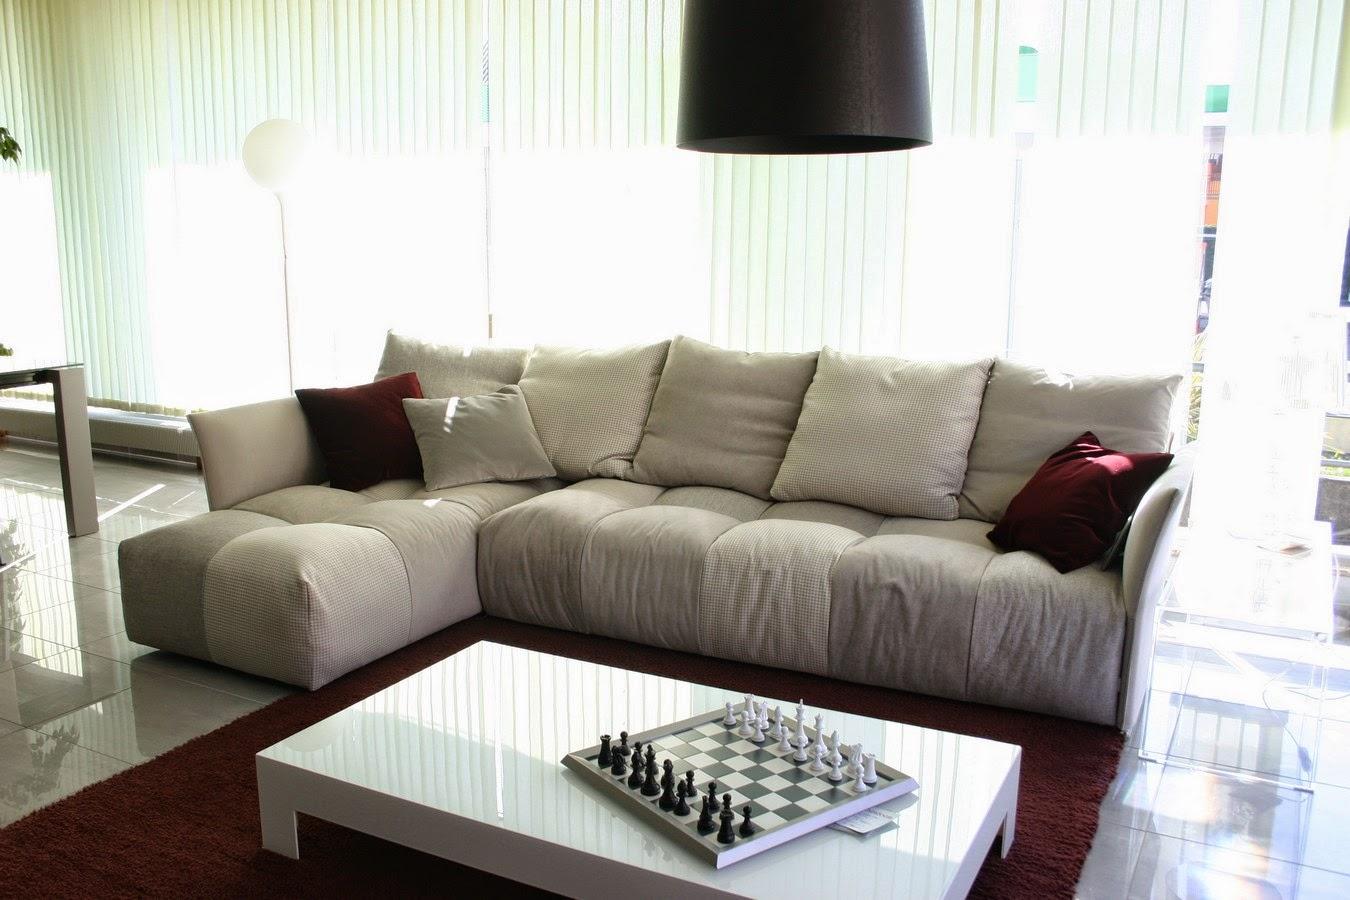 Emejing Divani E Divani Varese Contemporary - Idee Arredamento Casa ...